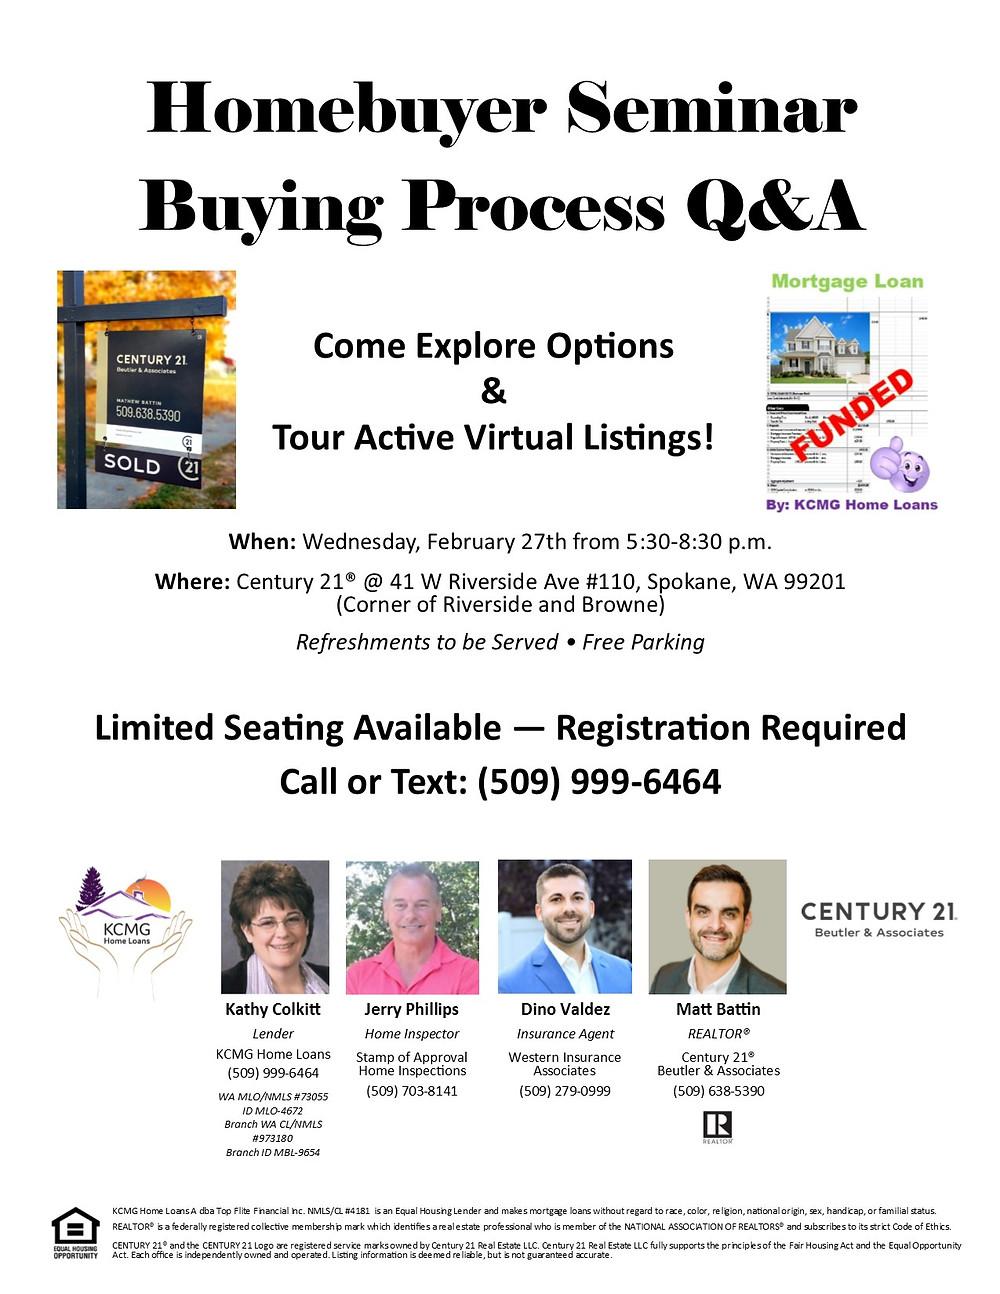 Homebuyer Seminar Flyer